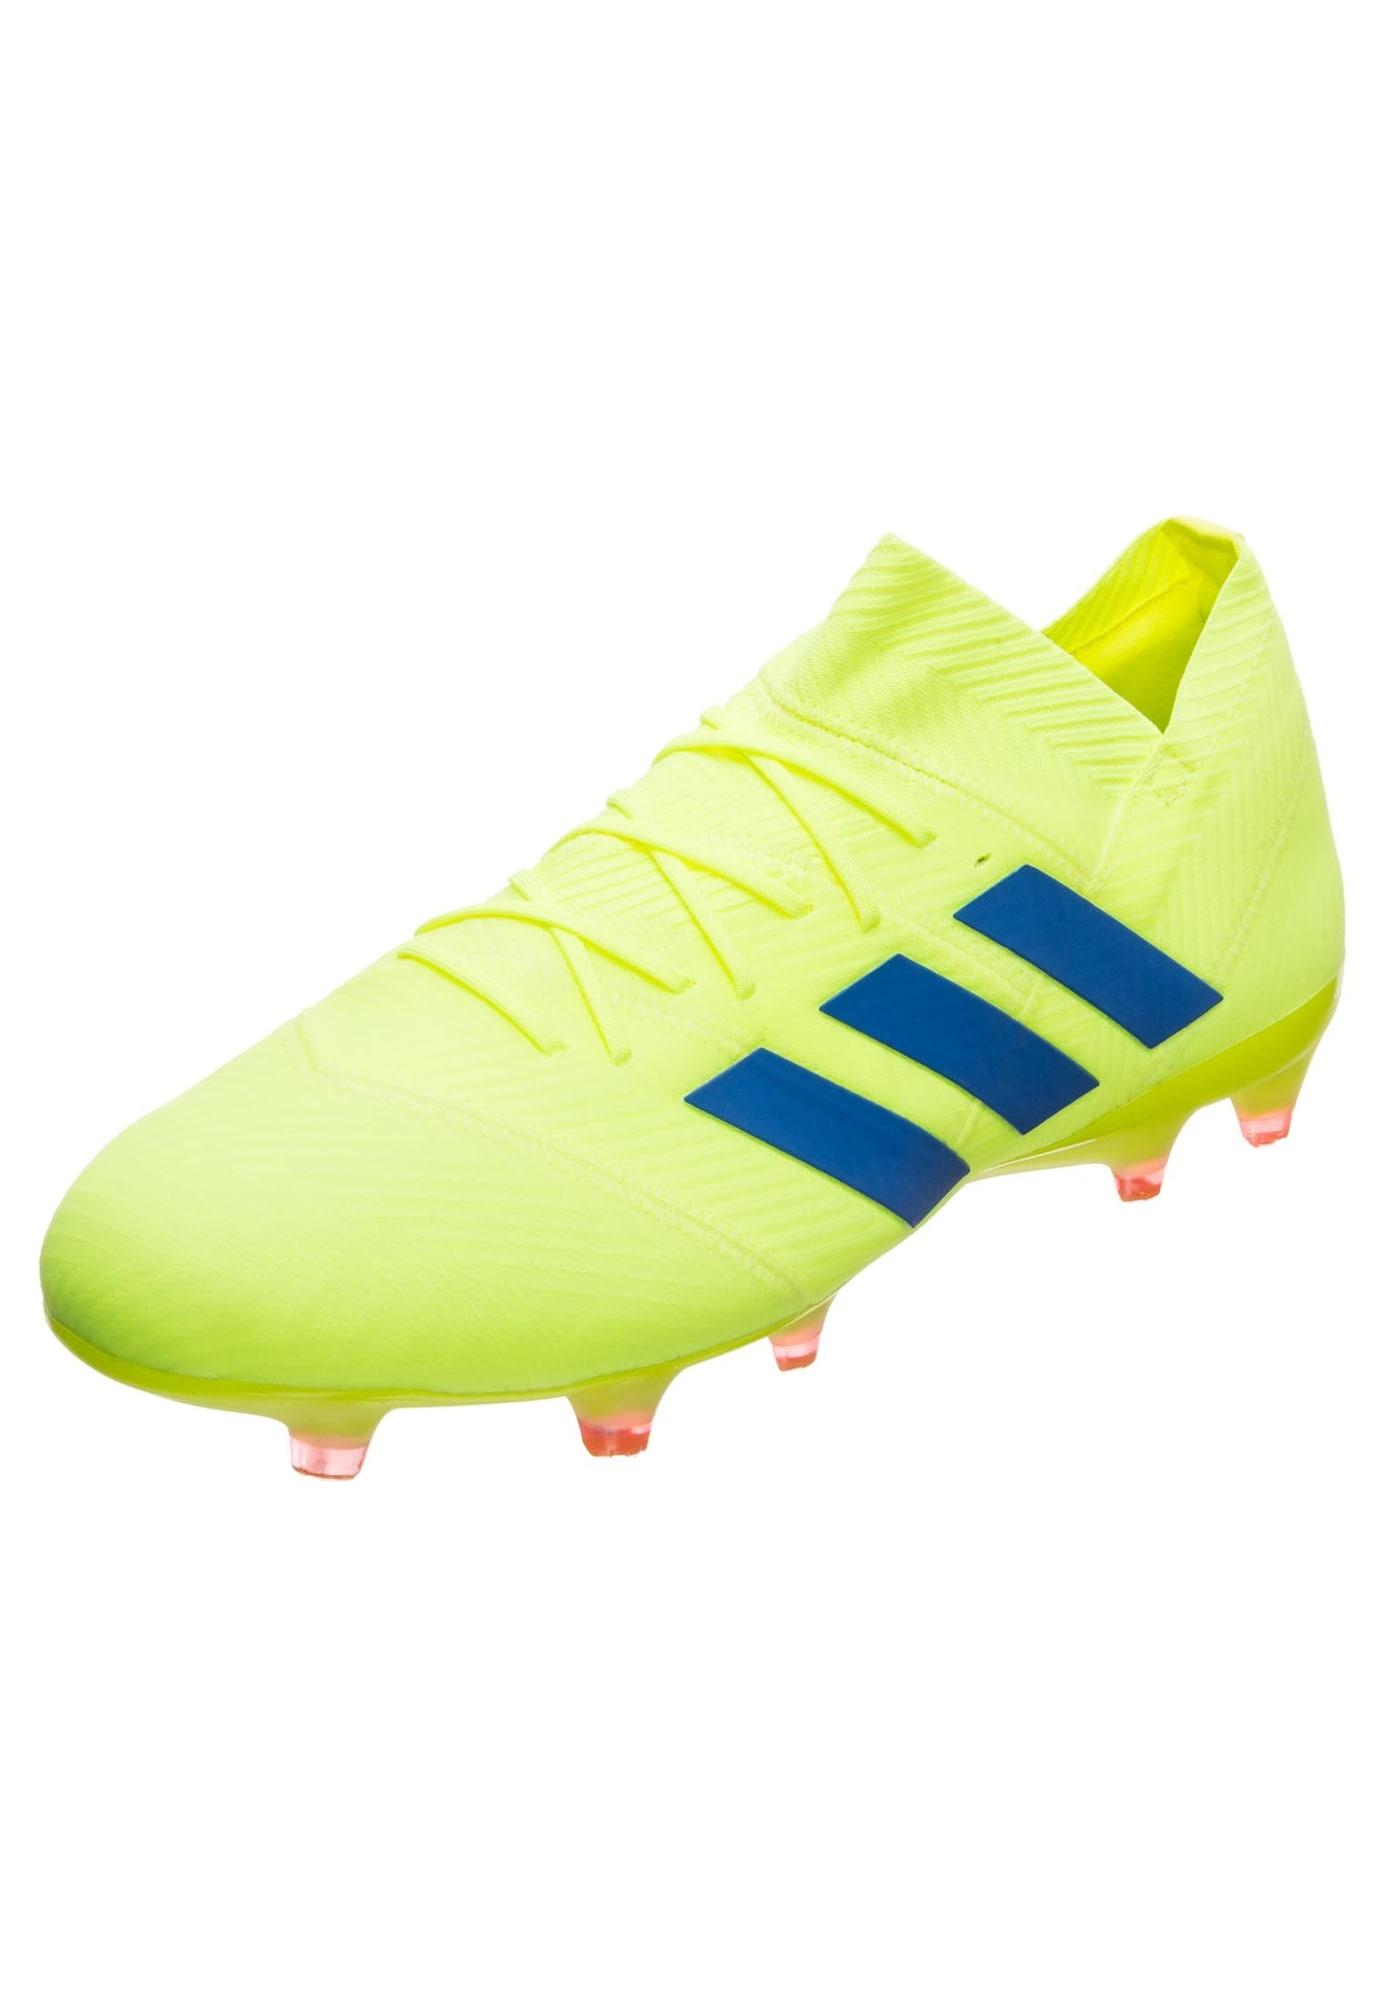 Fußballschuh 'Nemeziz 18.1 FG' | Schuhe > Sportschuhe > Fußballschuhe | Blau - Rot | ADIDAS PERFORMANCE